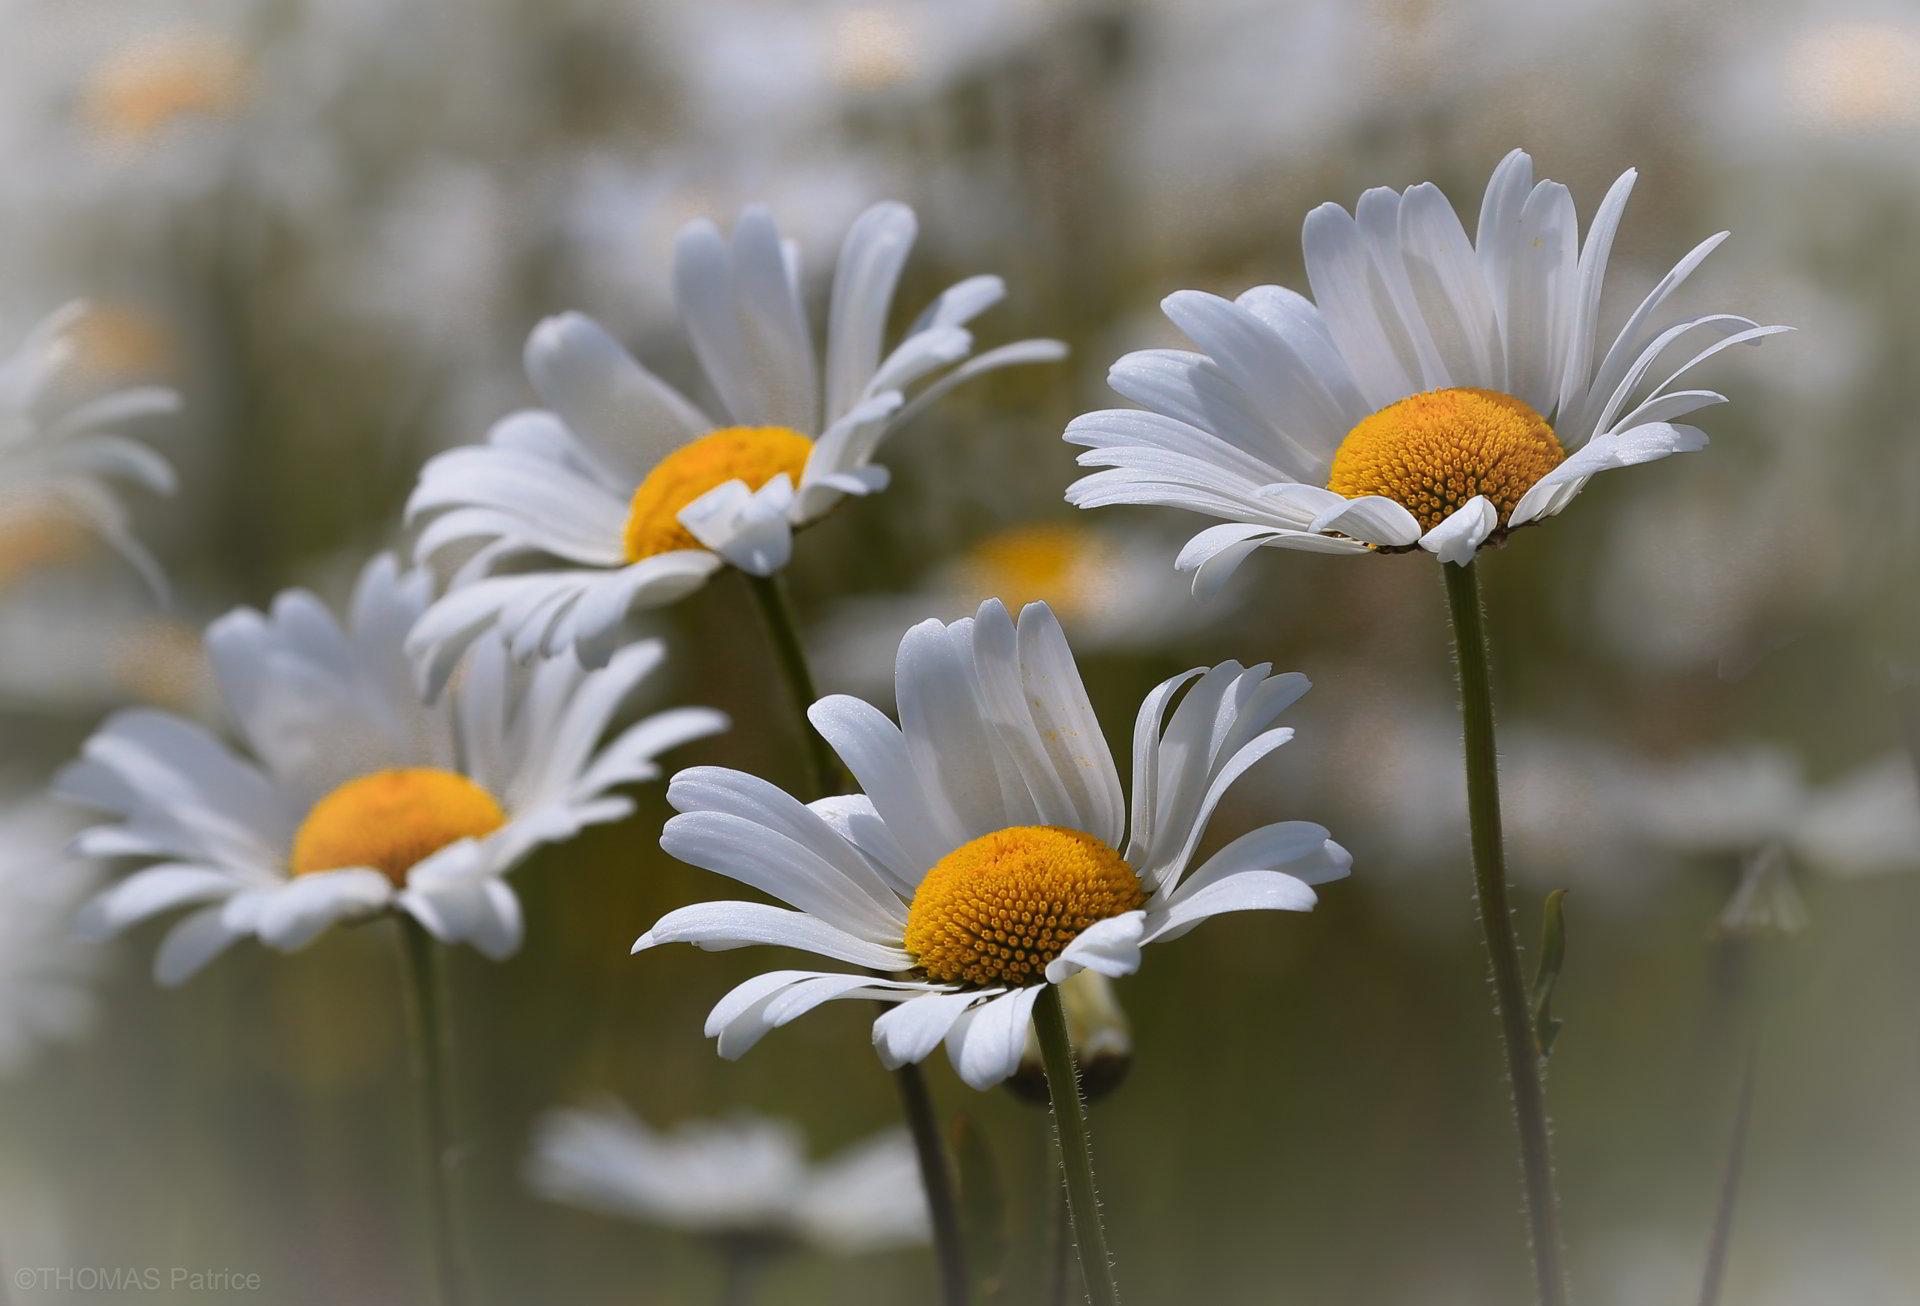 hinh anh hoa cuc dep 74